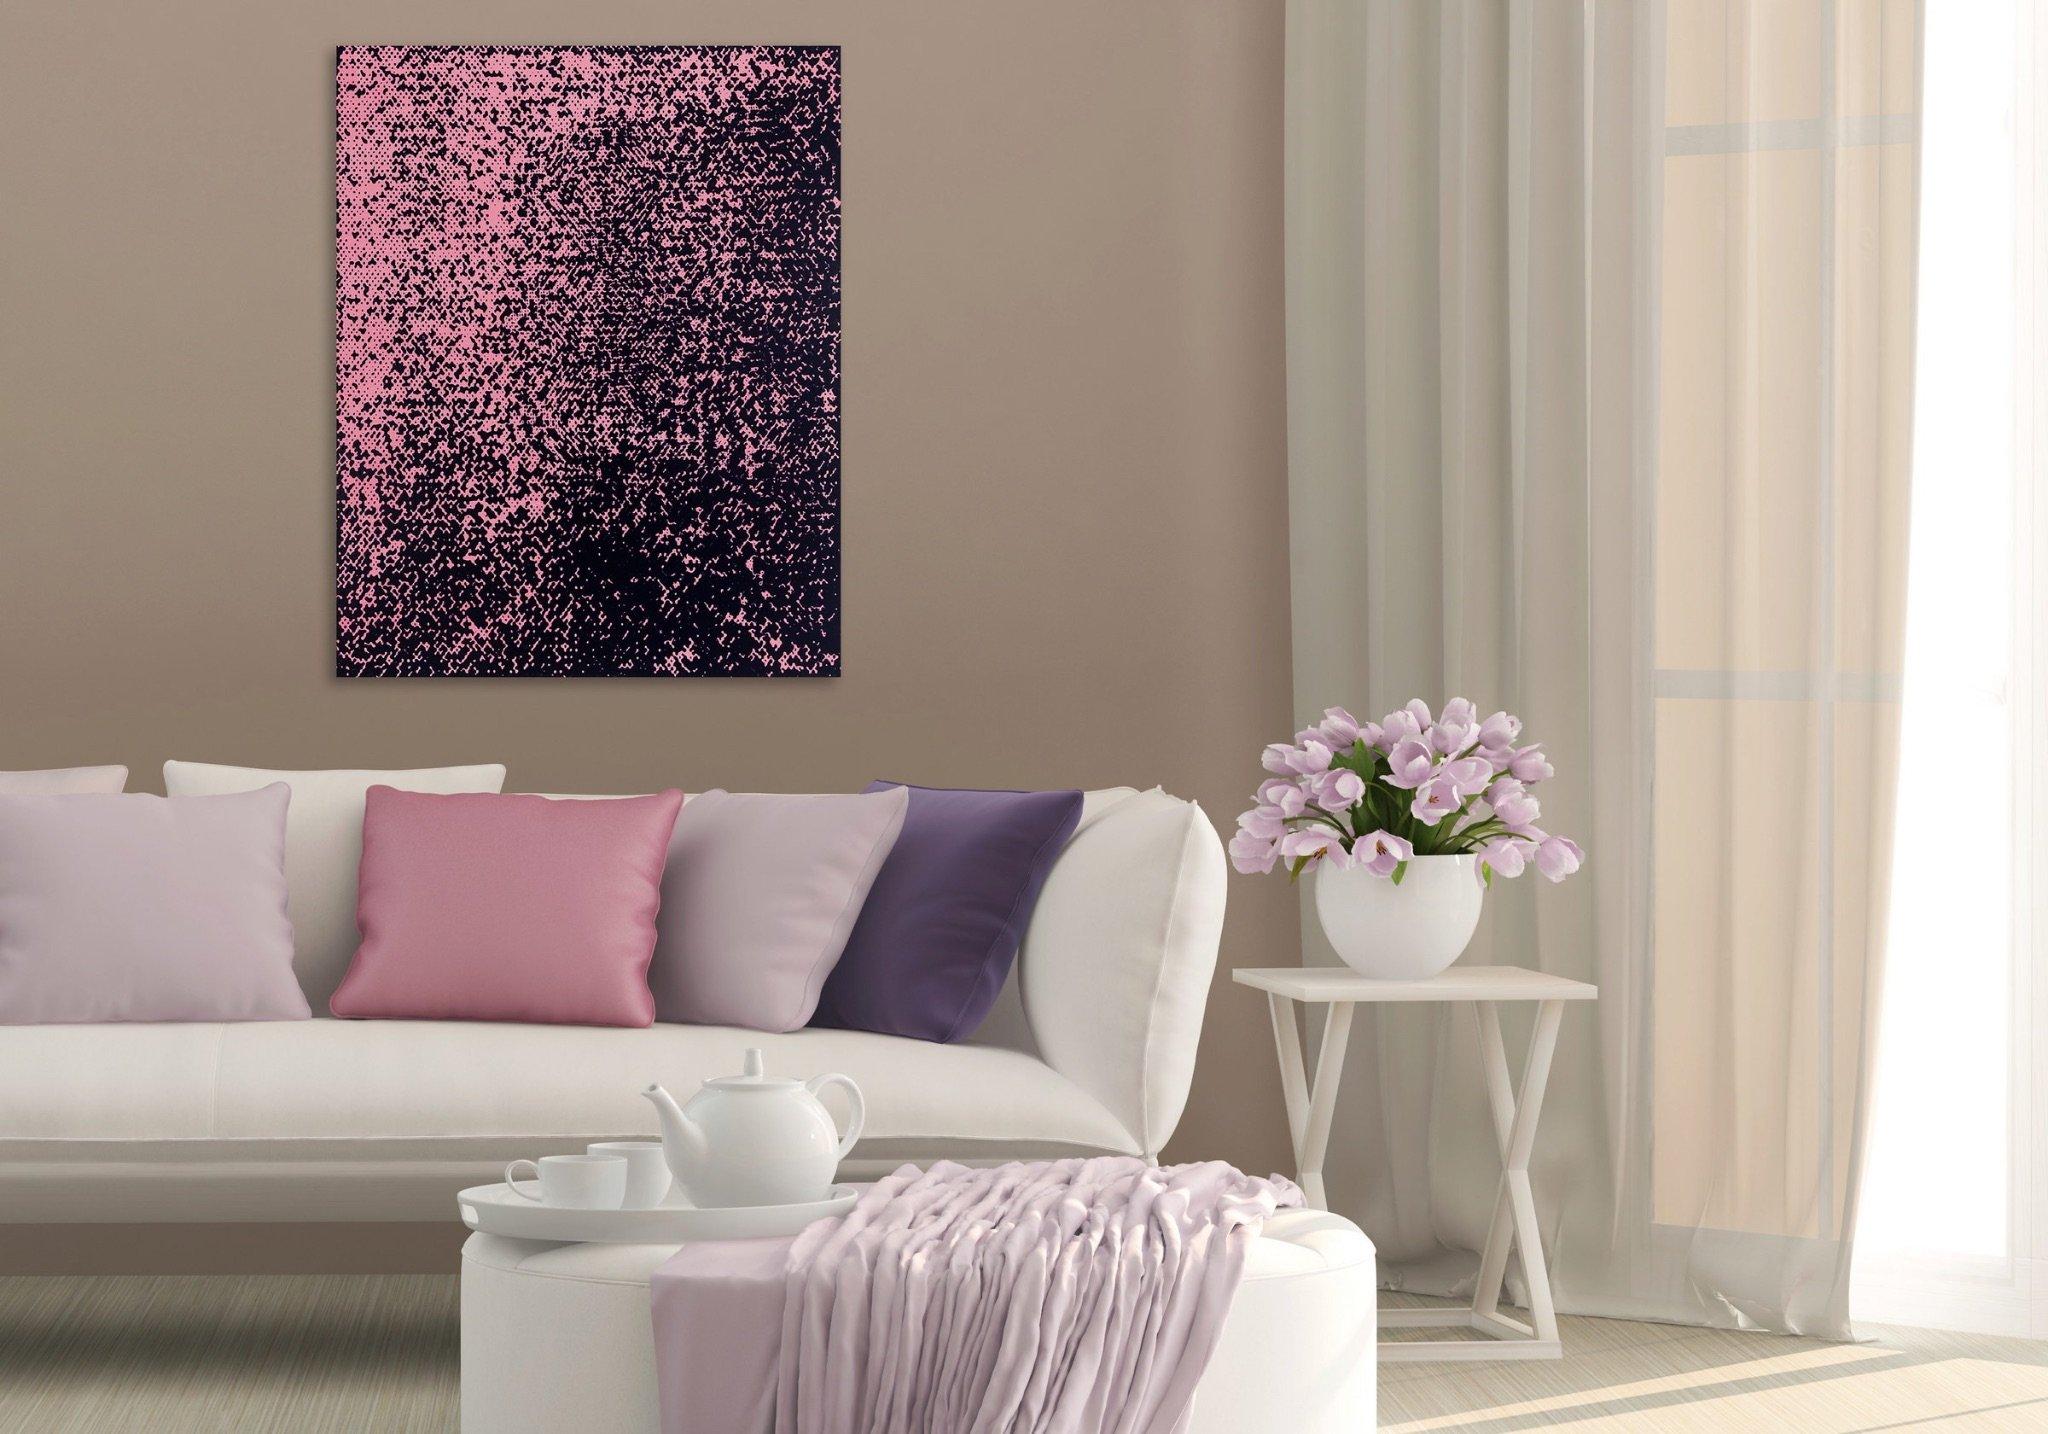 Картина на стене в гостиной